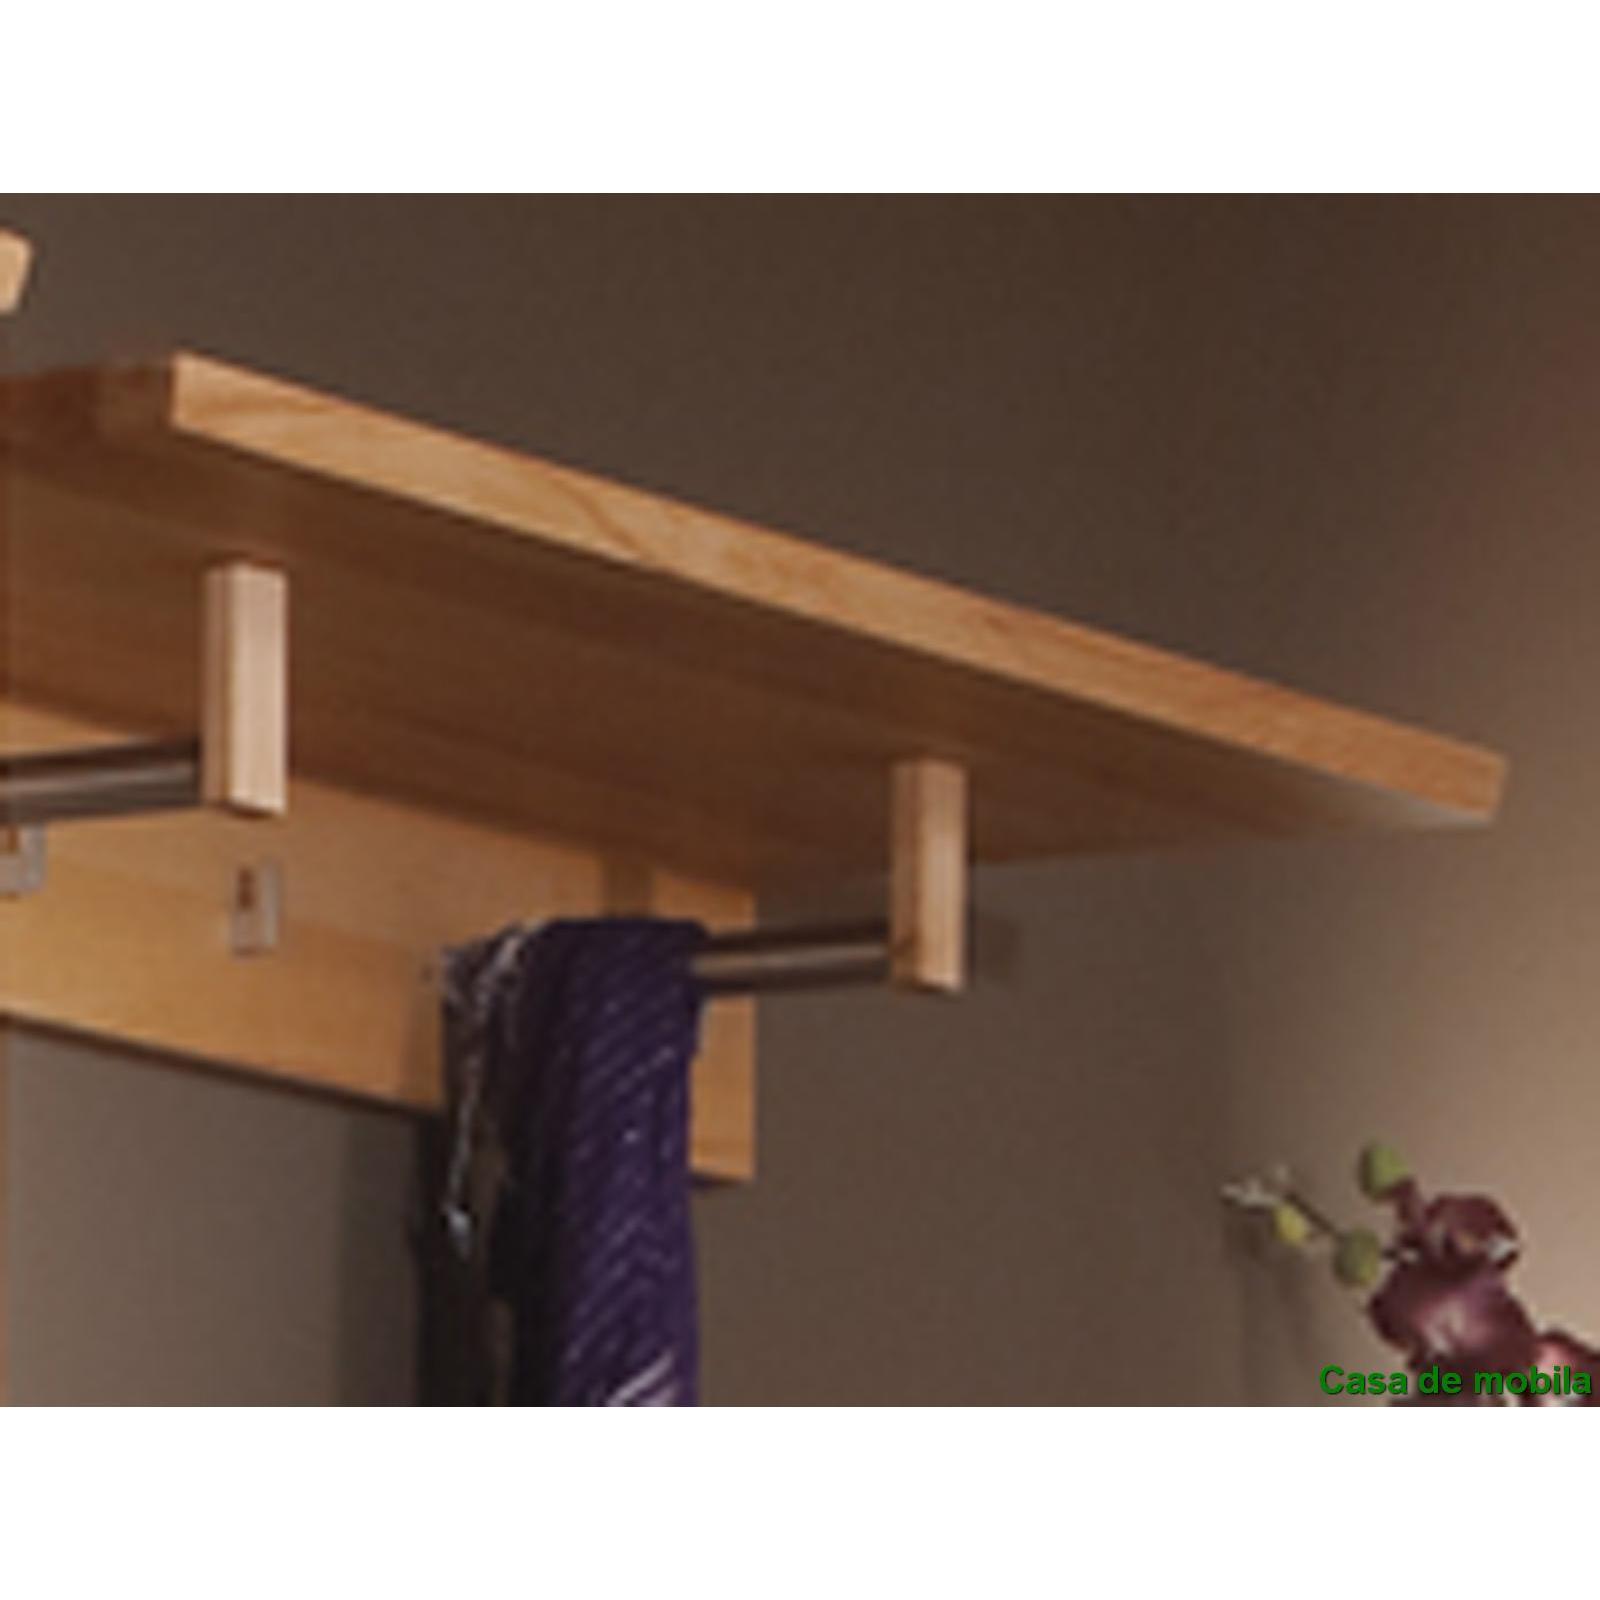 hutablage garderobe wandgarderobe flurm bel kernbuche holz buche massiv ge lt ebay. Black Bedroom Furniture Sets. Home Design Ideas